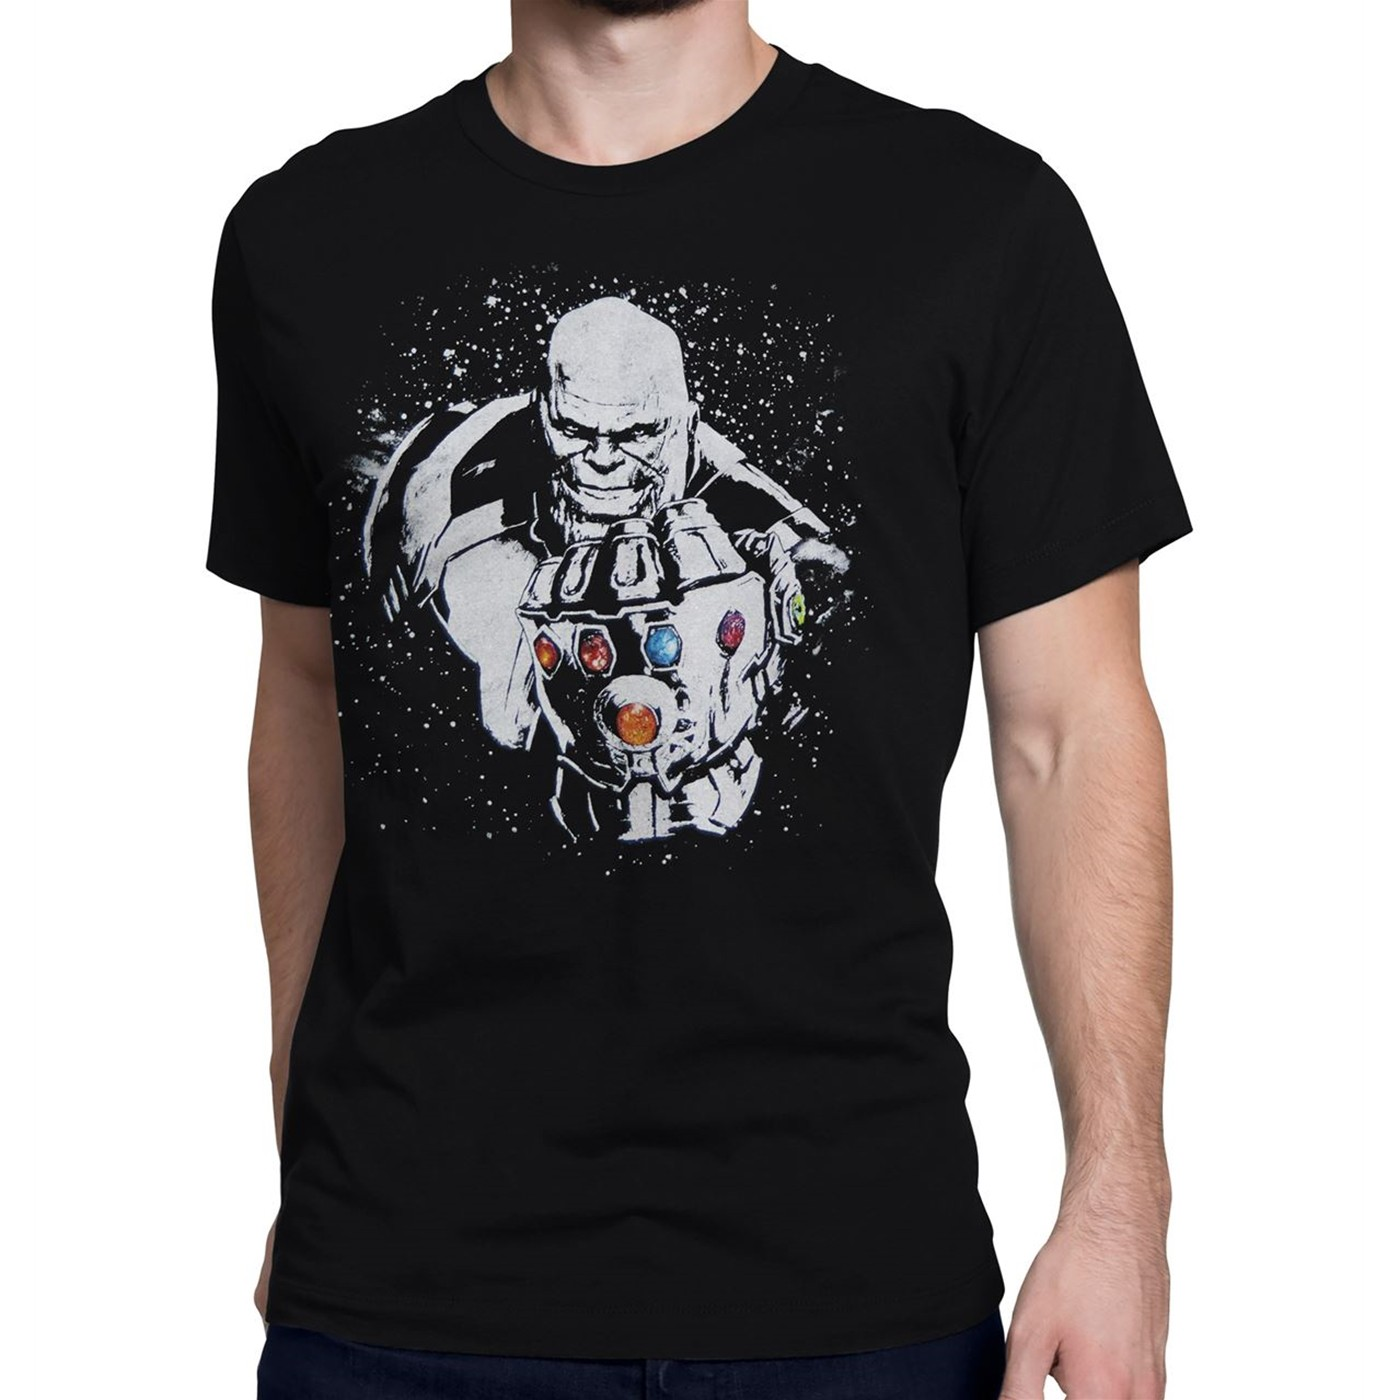 Avengers Infinity War Thanos Space Dye Men's T-Shirt